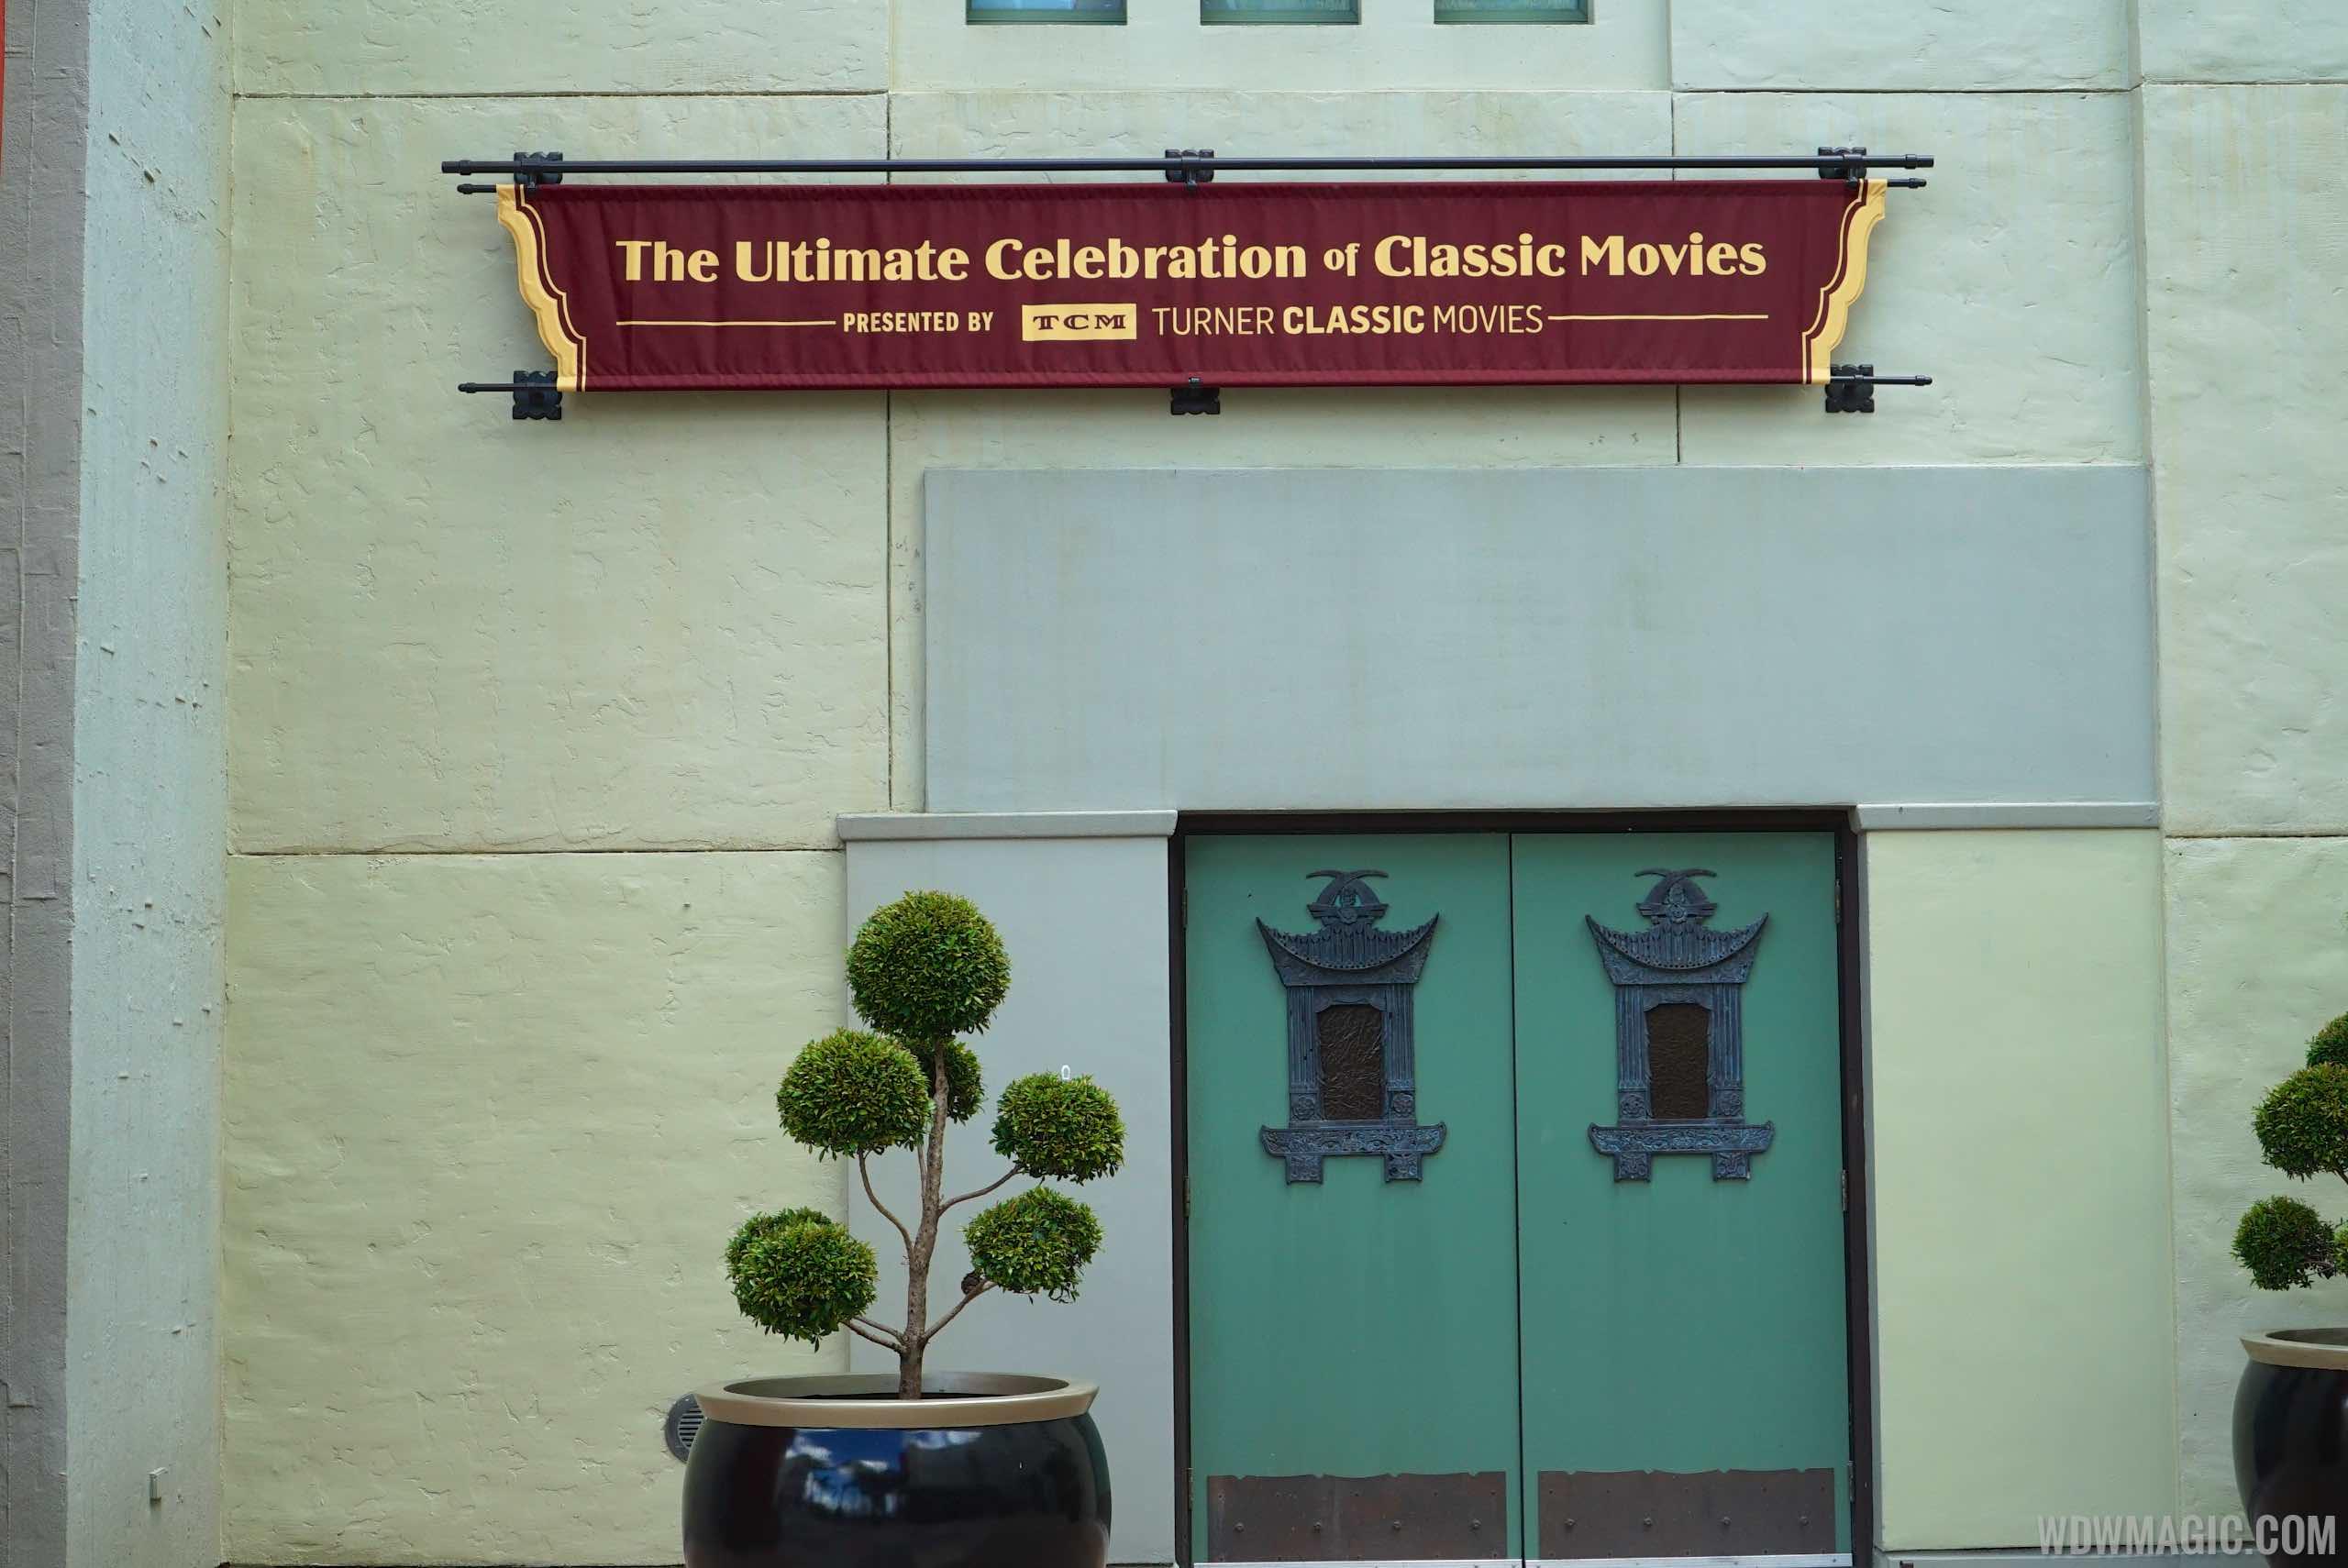 The Great Movie Ride TCM updates - New signage